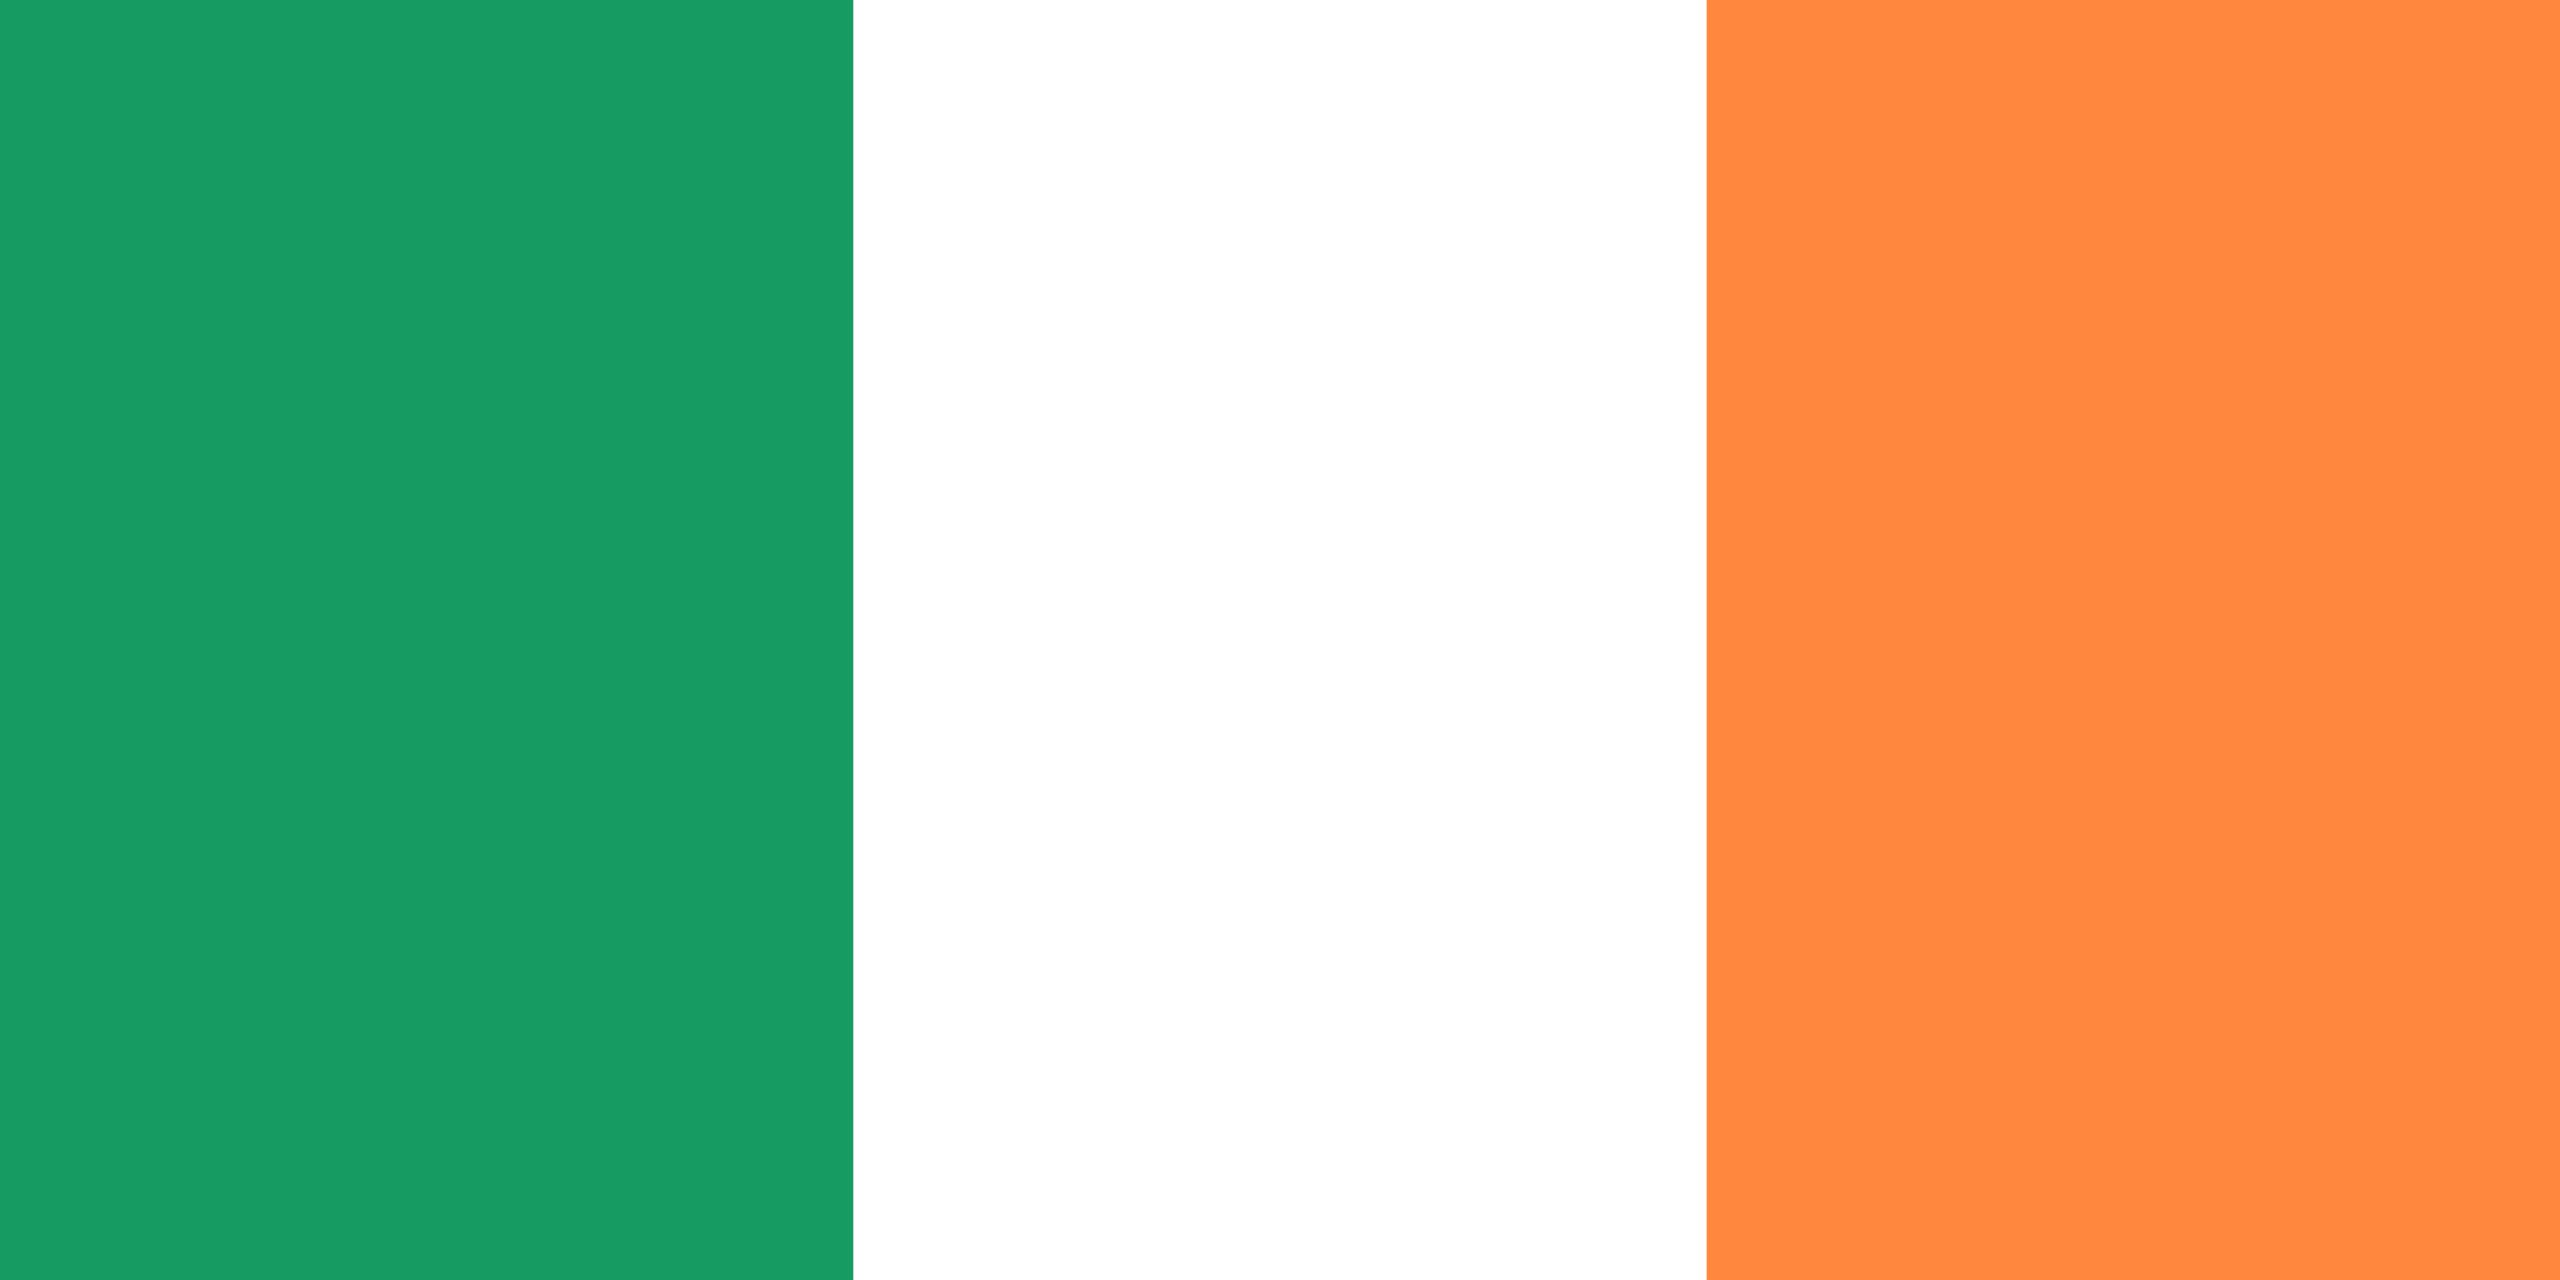 File:Flag of Ireland.svg - Wikimedia Commons